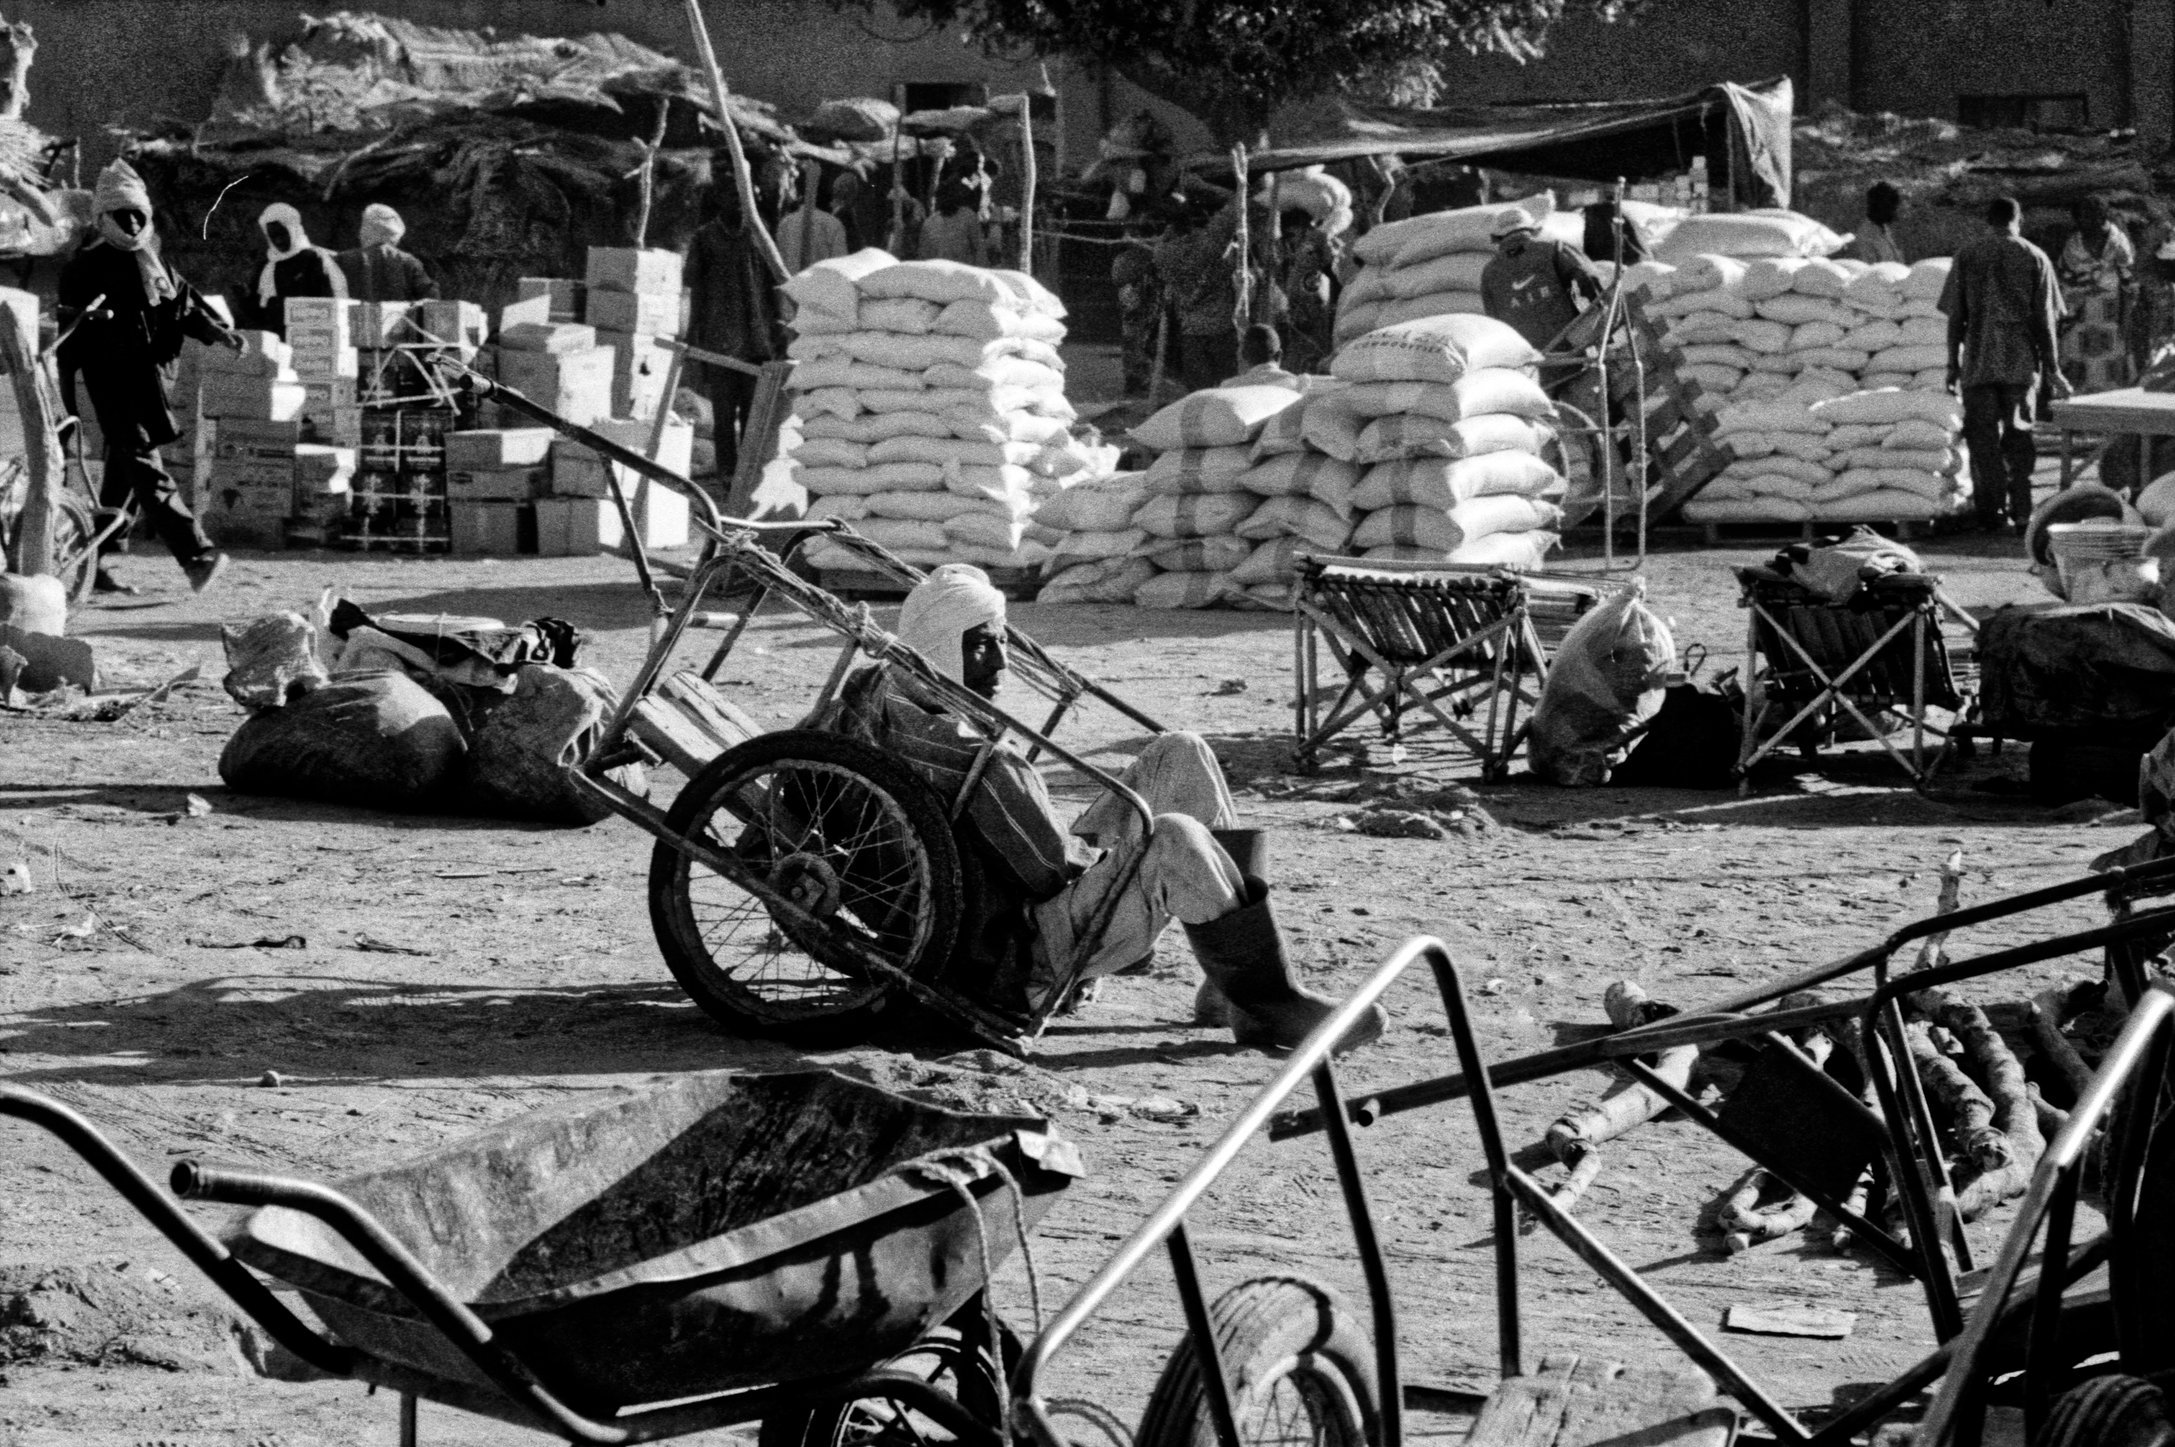 Djenné, Mali, 2002